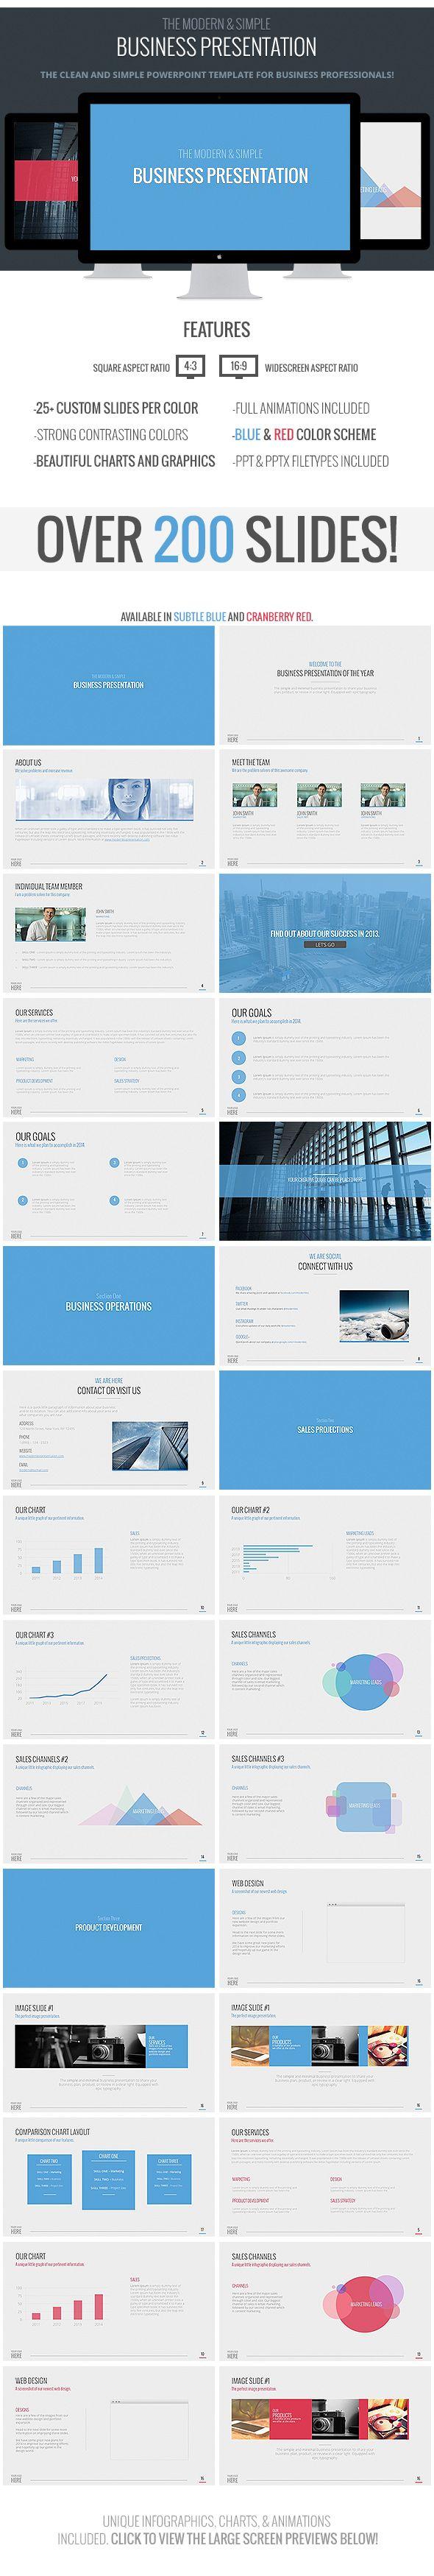 Modern Business Powerpoint Presentation - http://graphicriver.net/item/modern-business-powerpoint-template/6266977?WT.ac=portfolio&WT.seg_1=portfolio&WT.z_author=MikeMoloney&ref=MikeMoloney